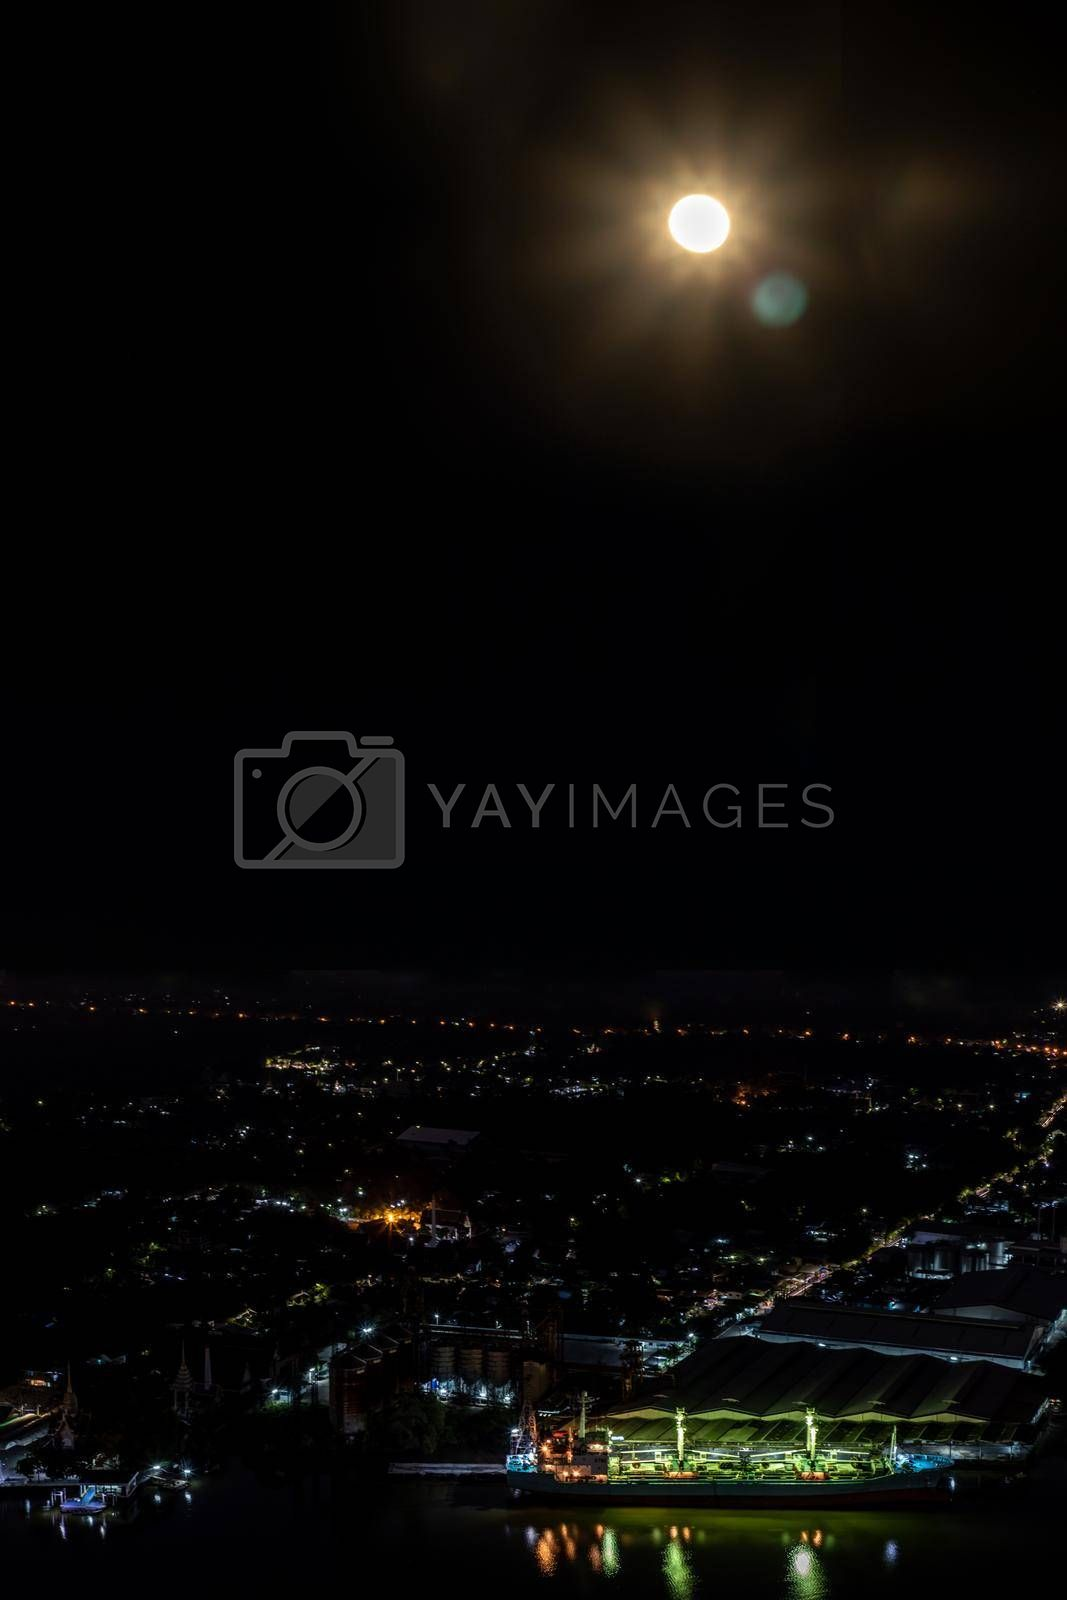 Bangkok, Thailand - Dec 7, 2019 : Full moon In the dark sky and The Beauty Of The Chao Phraya River, Cityscape of Chao Phraya River (Bang Kachao).